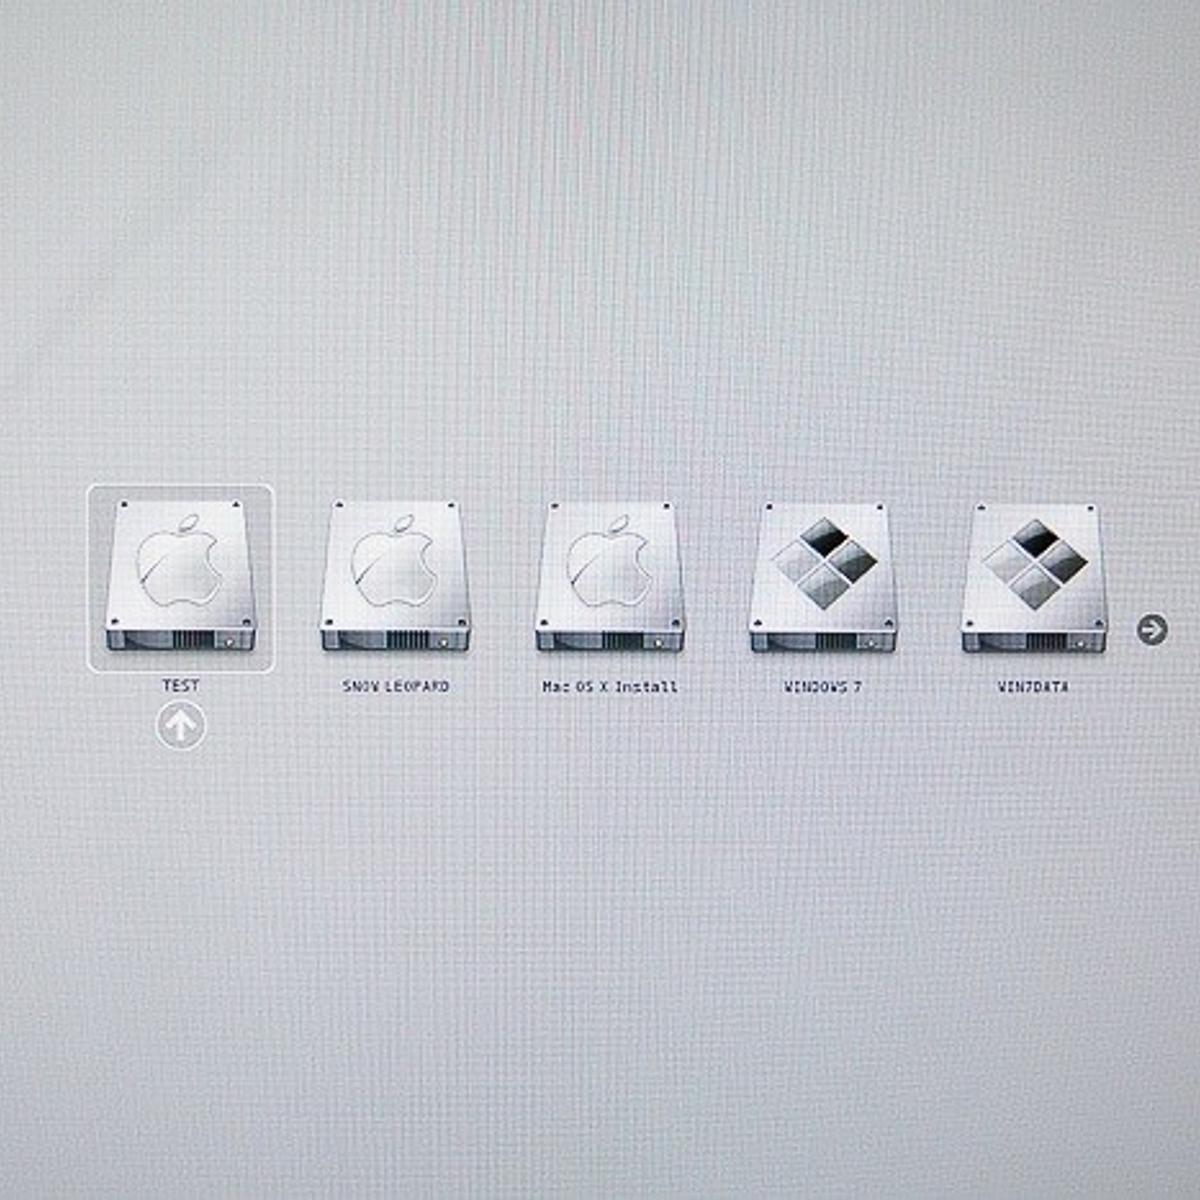 Bootloaders for mac